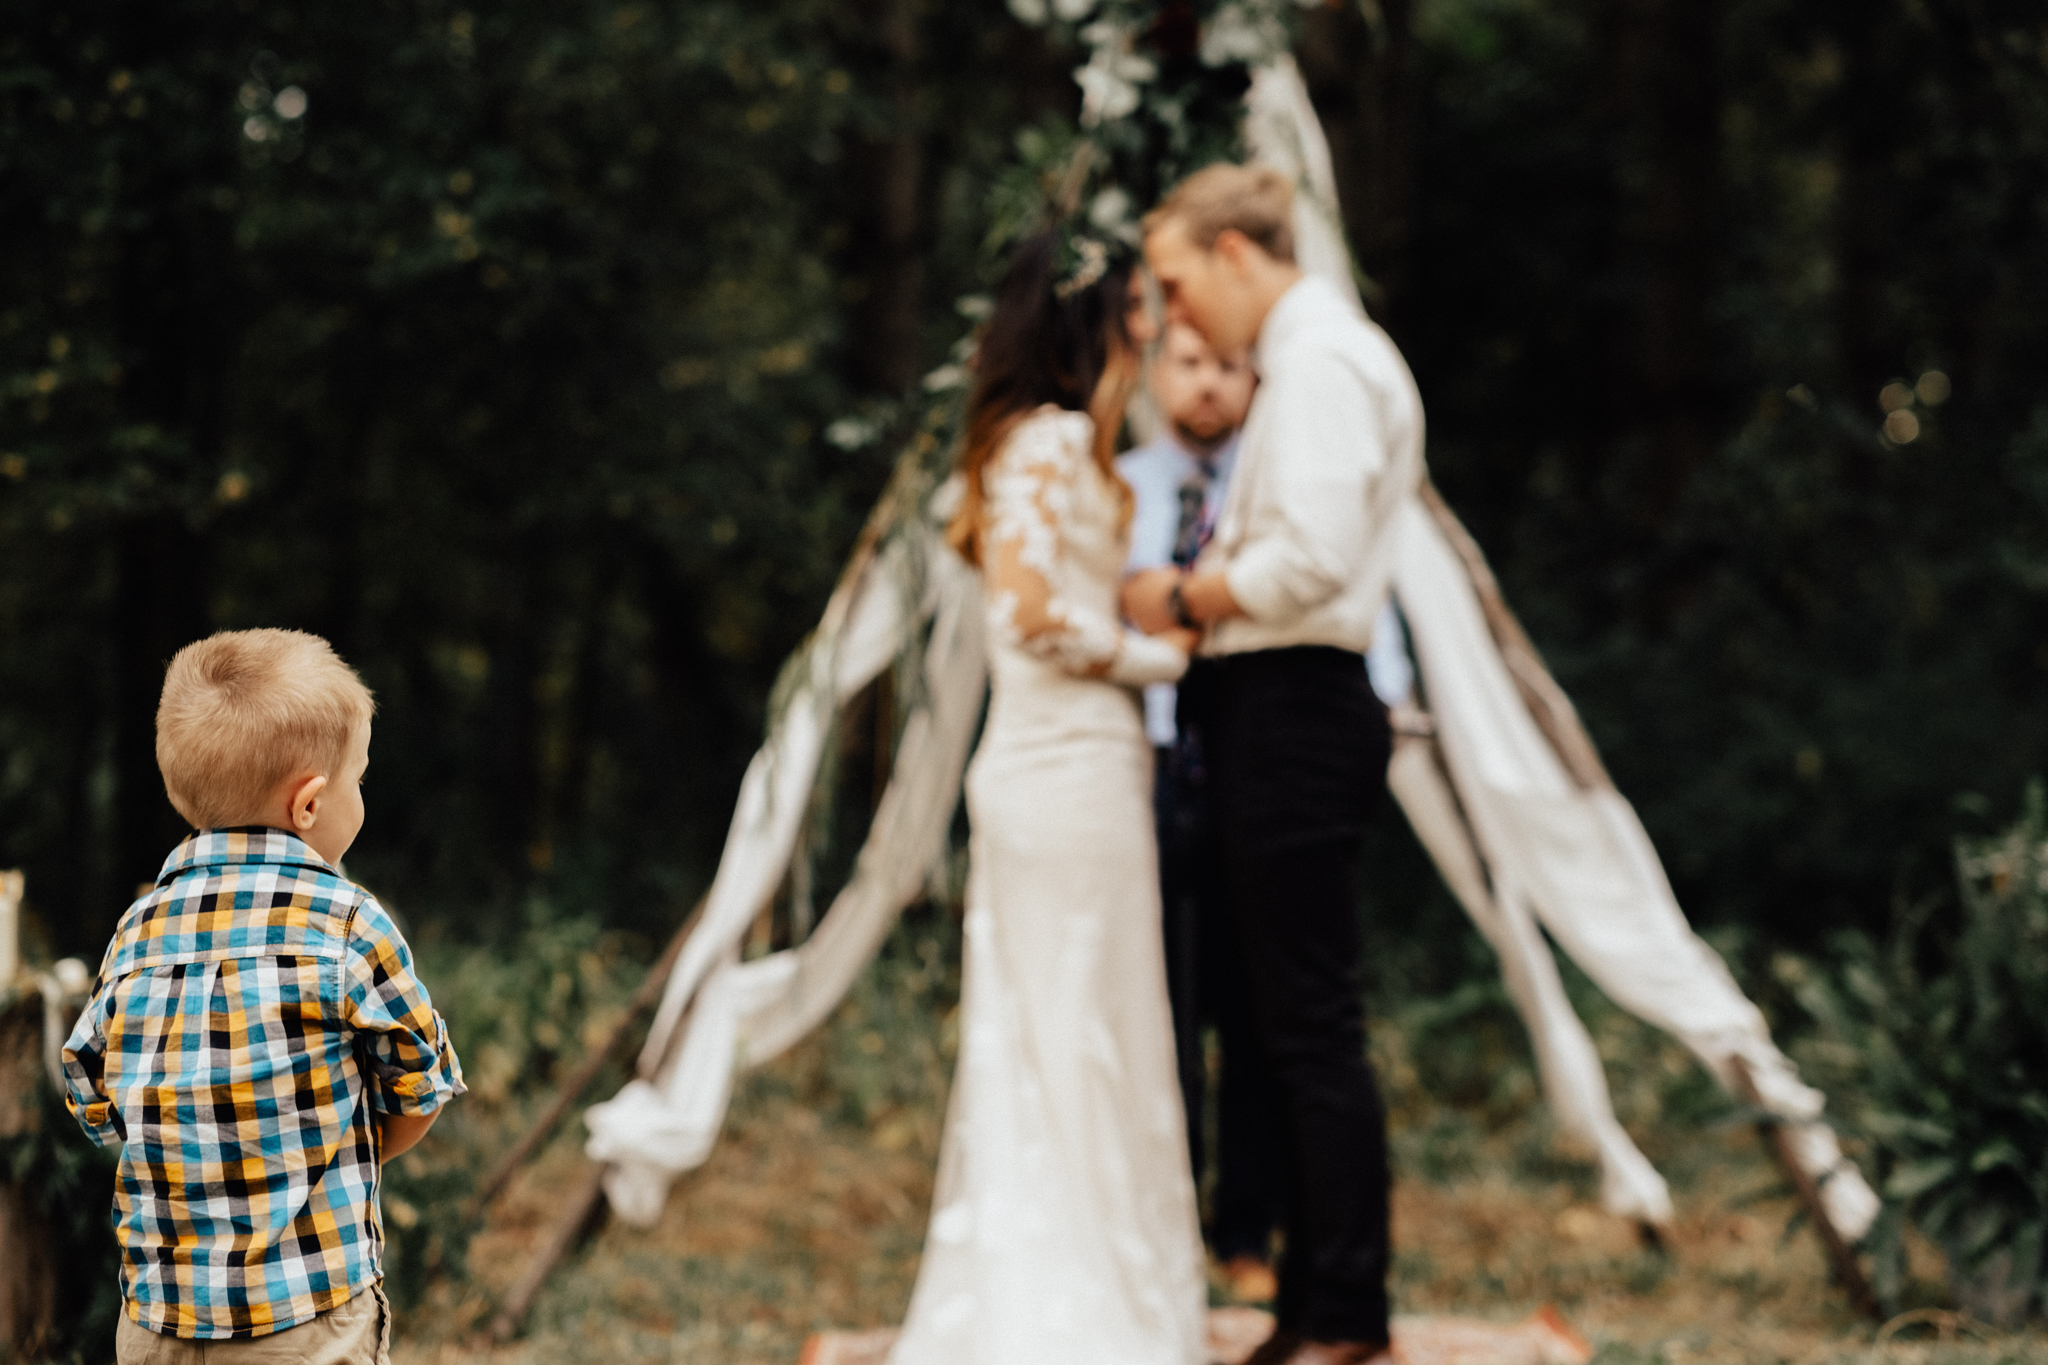 Arizona-Adventure-Elopement-Wedding-Photographer-27.jpg